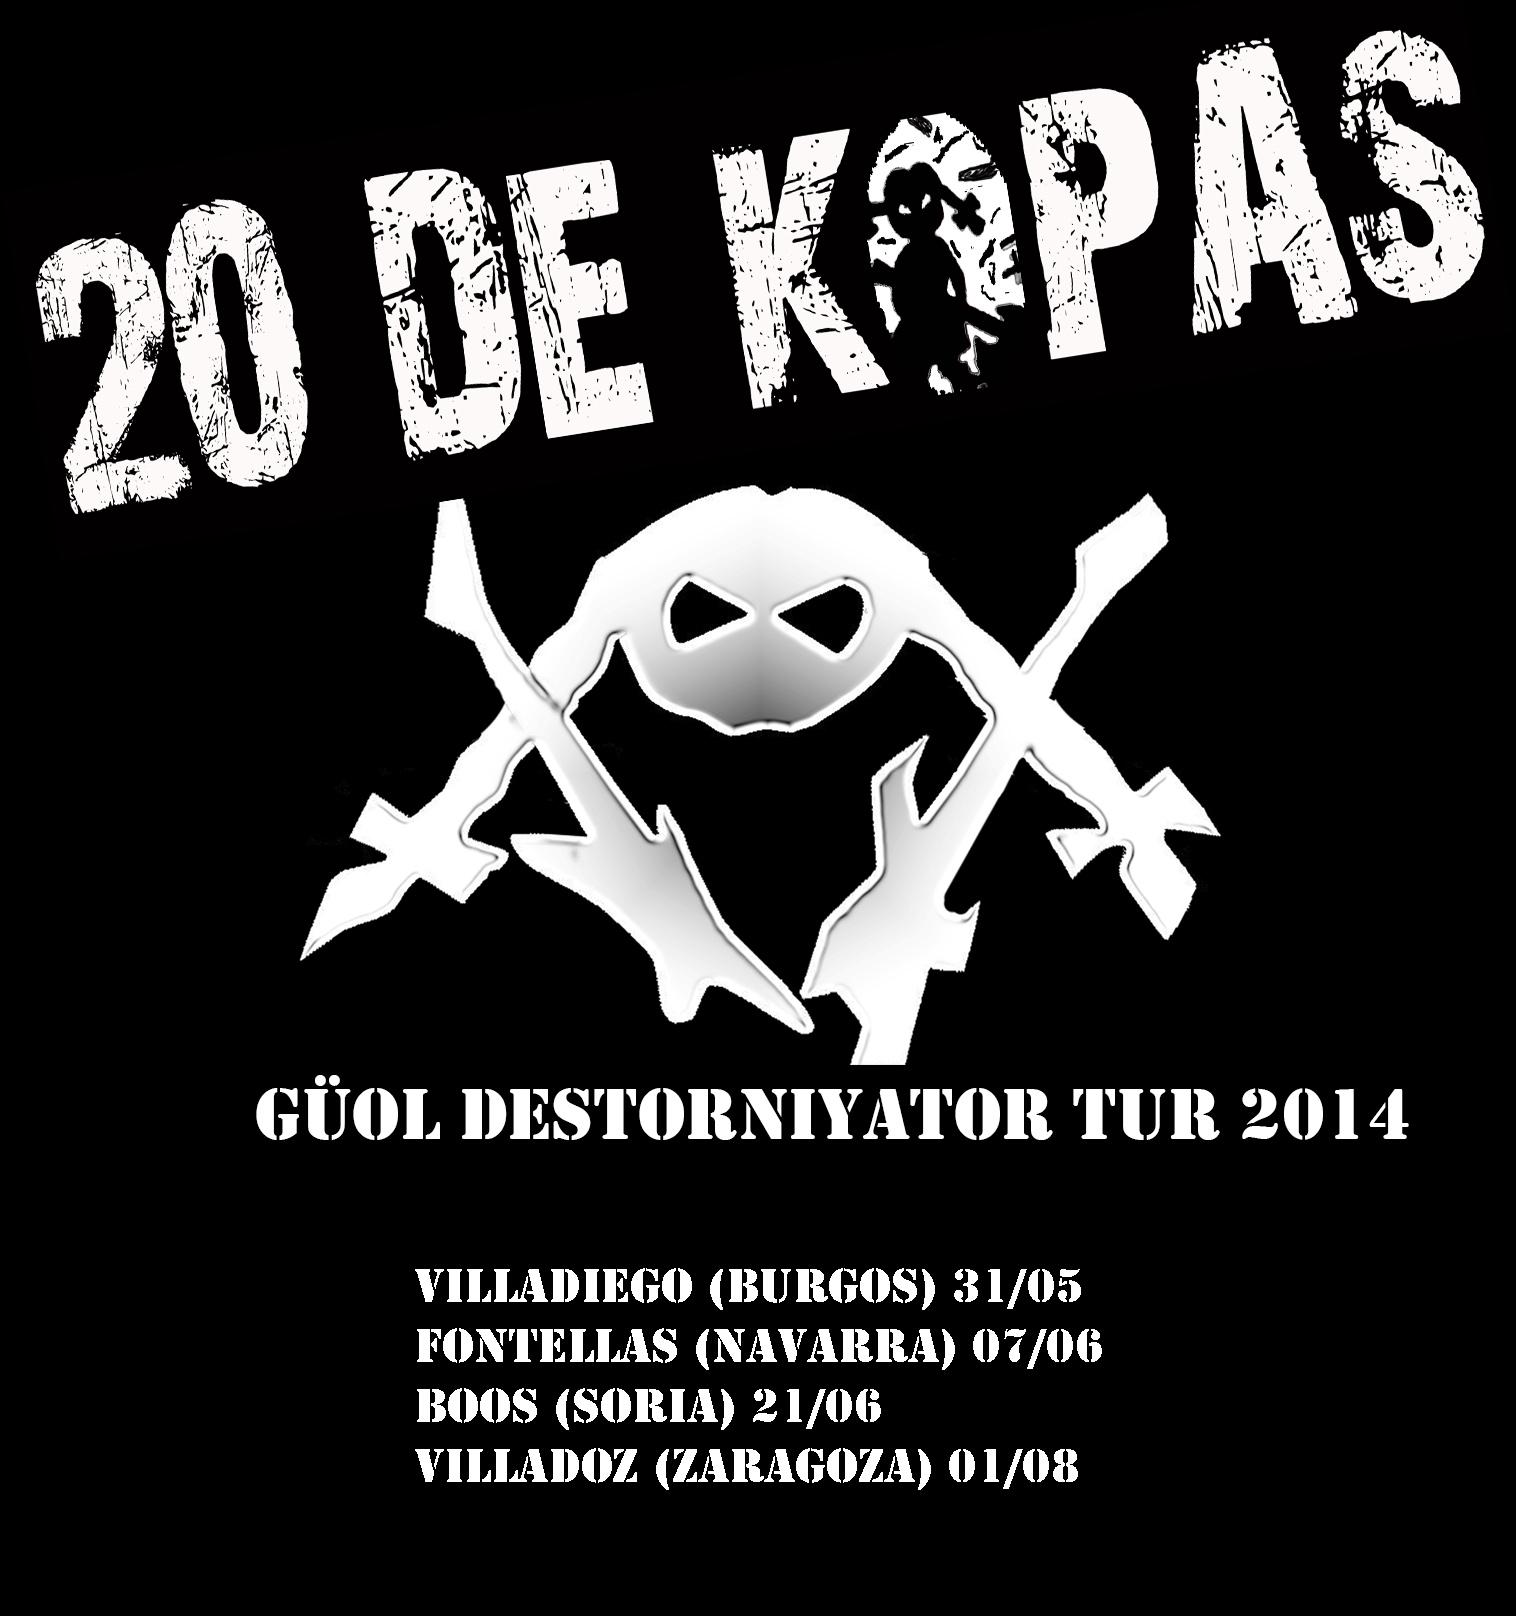 DestornillatorTour2014